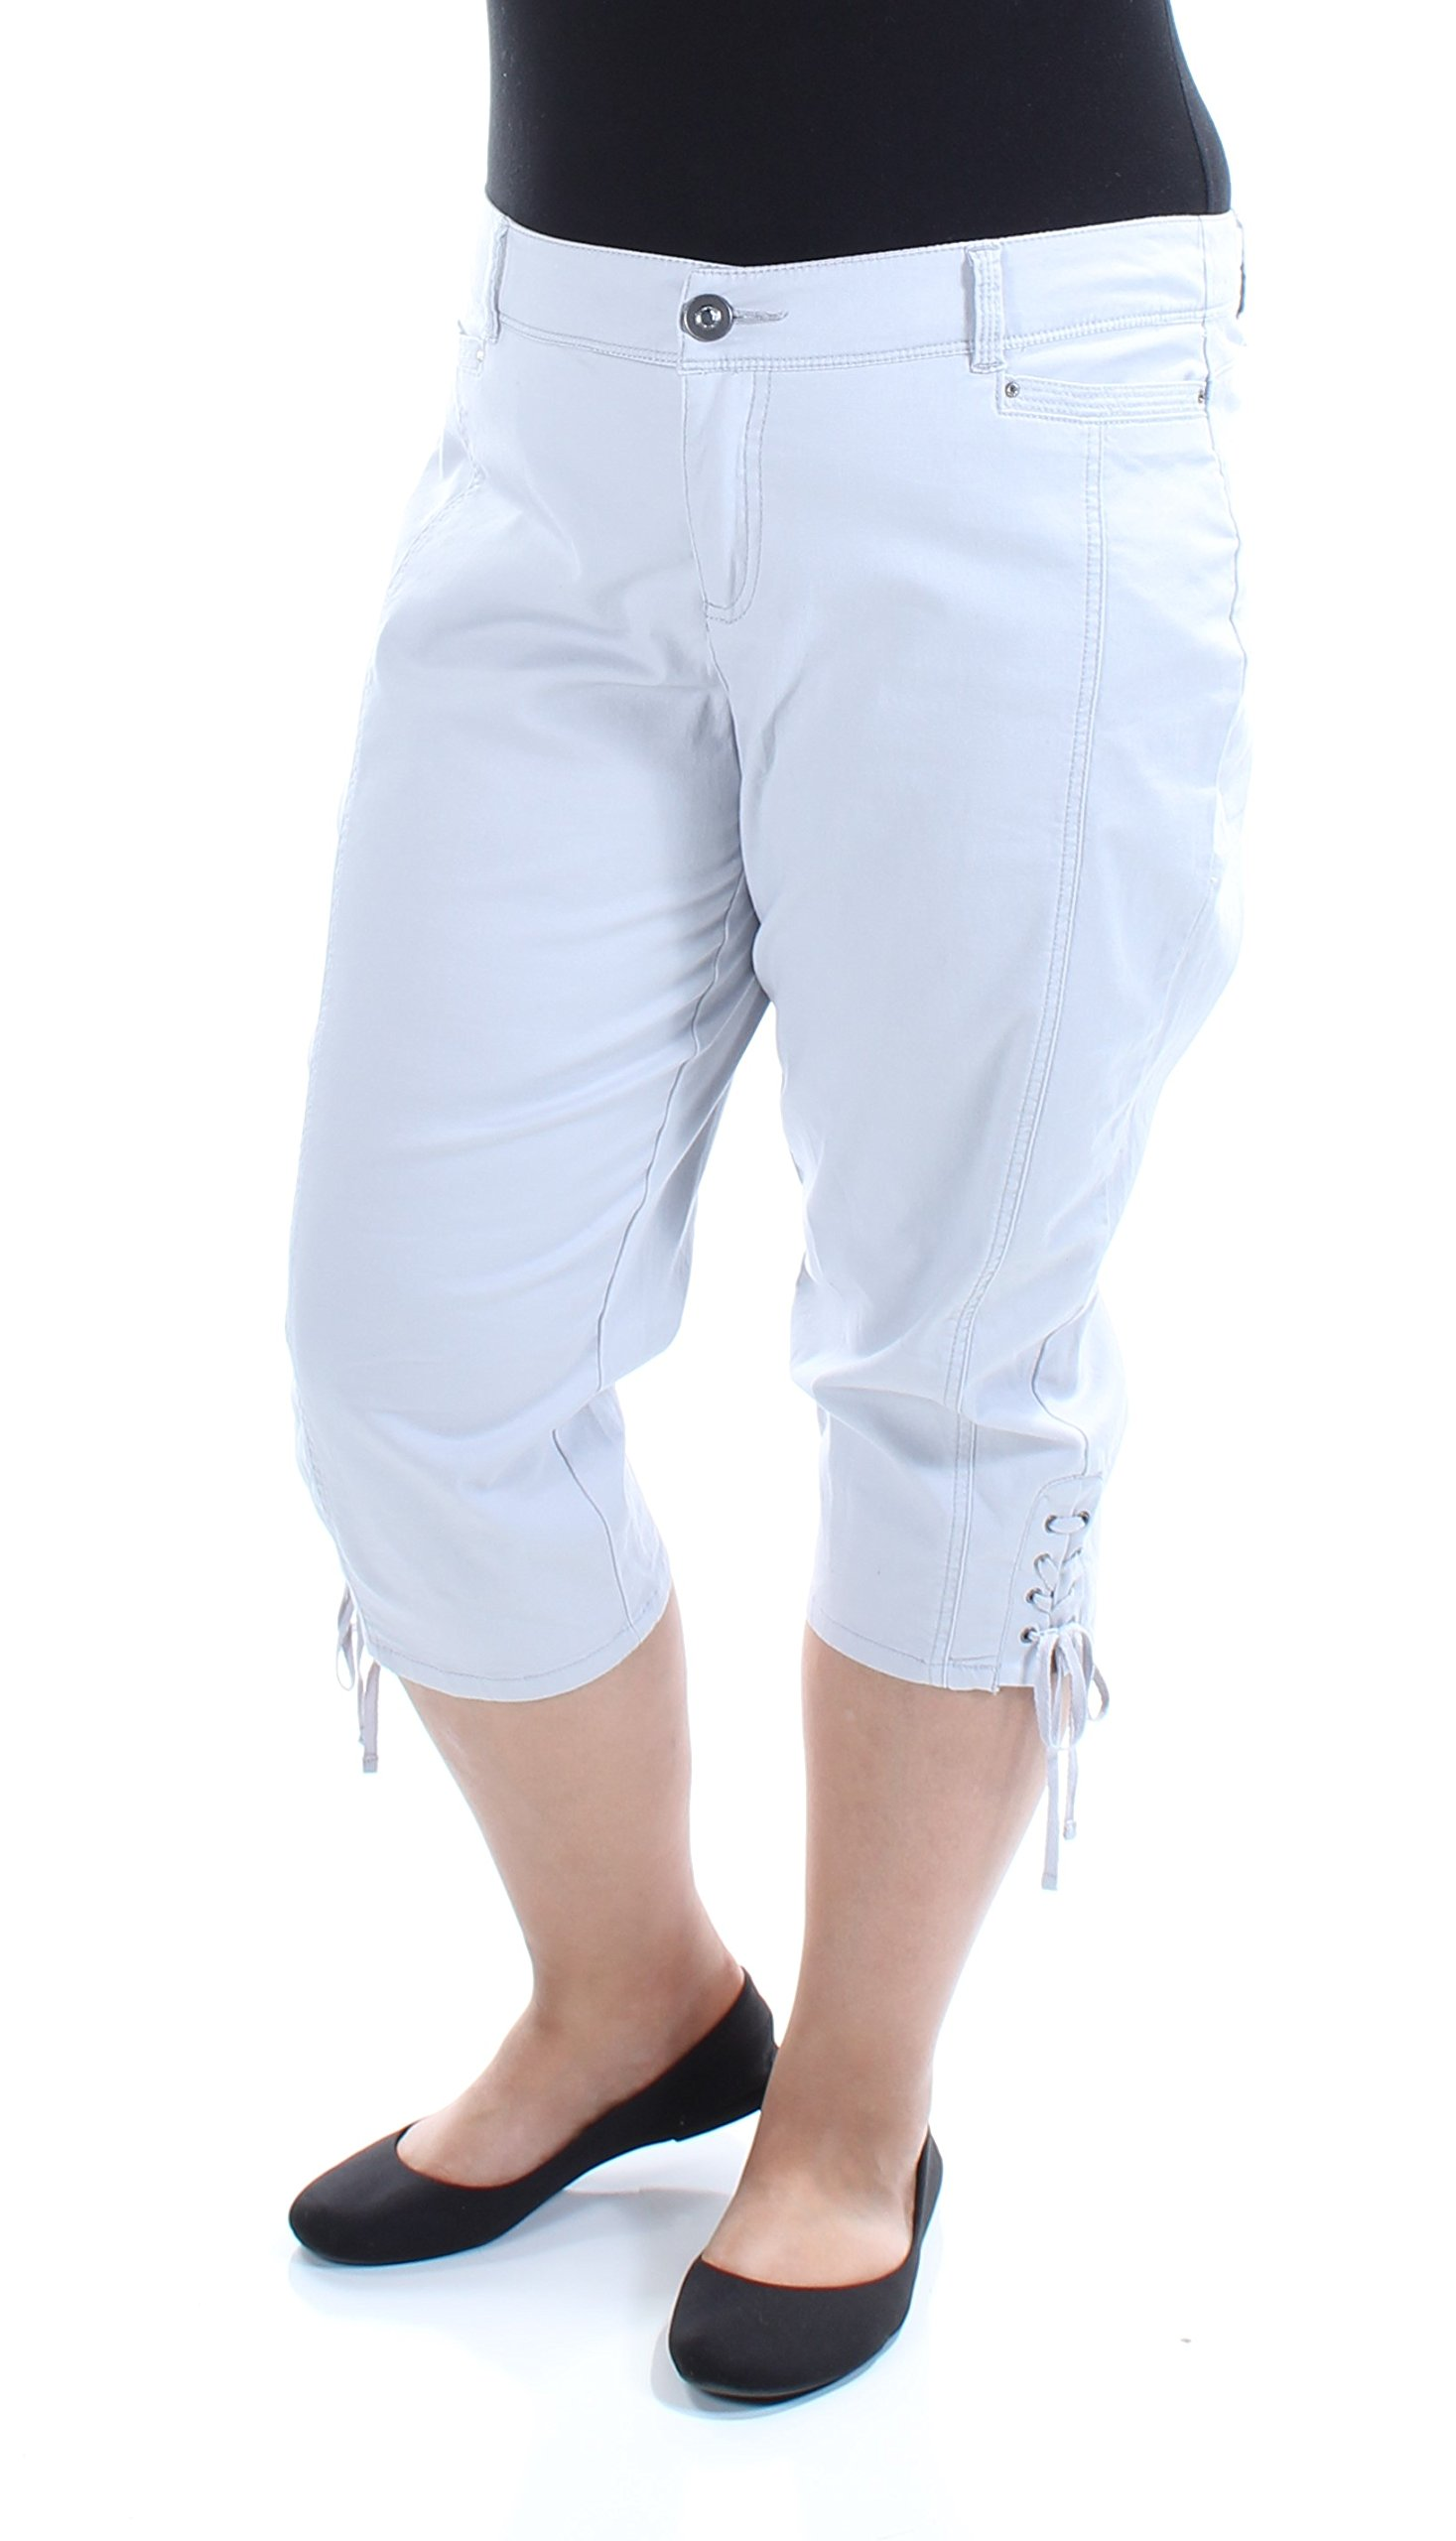 Style & Company $90 Womens New 1121 Gray Tie Casual Pants Petites 16 B+B